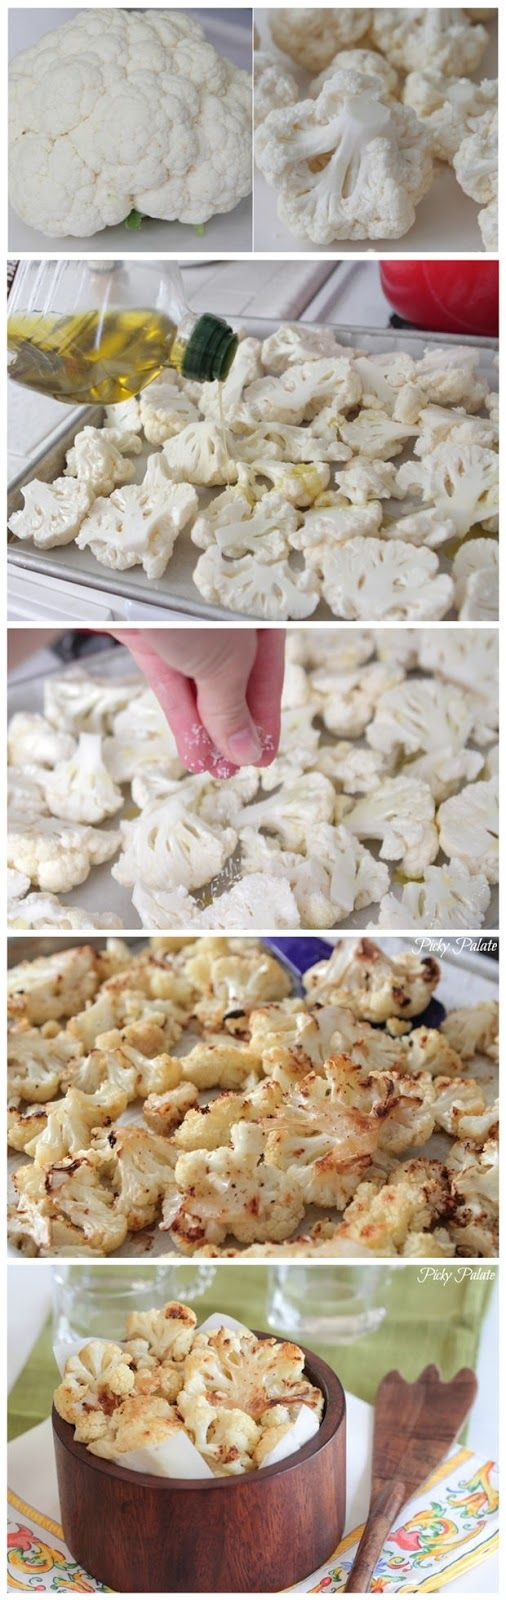 *ENGLISH || Roasted garlic cauliflower | Coliflor asada con ajo